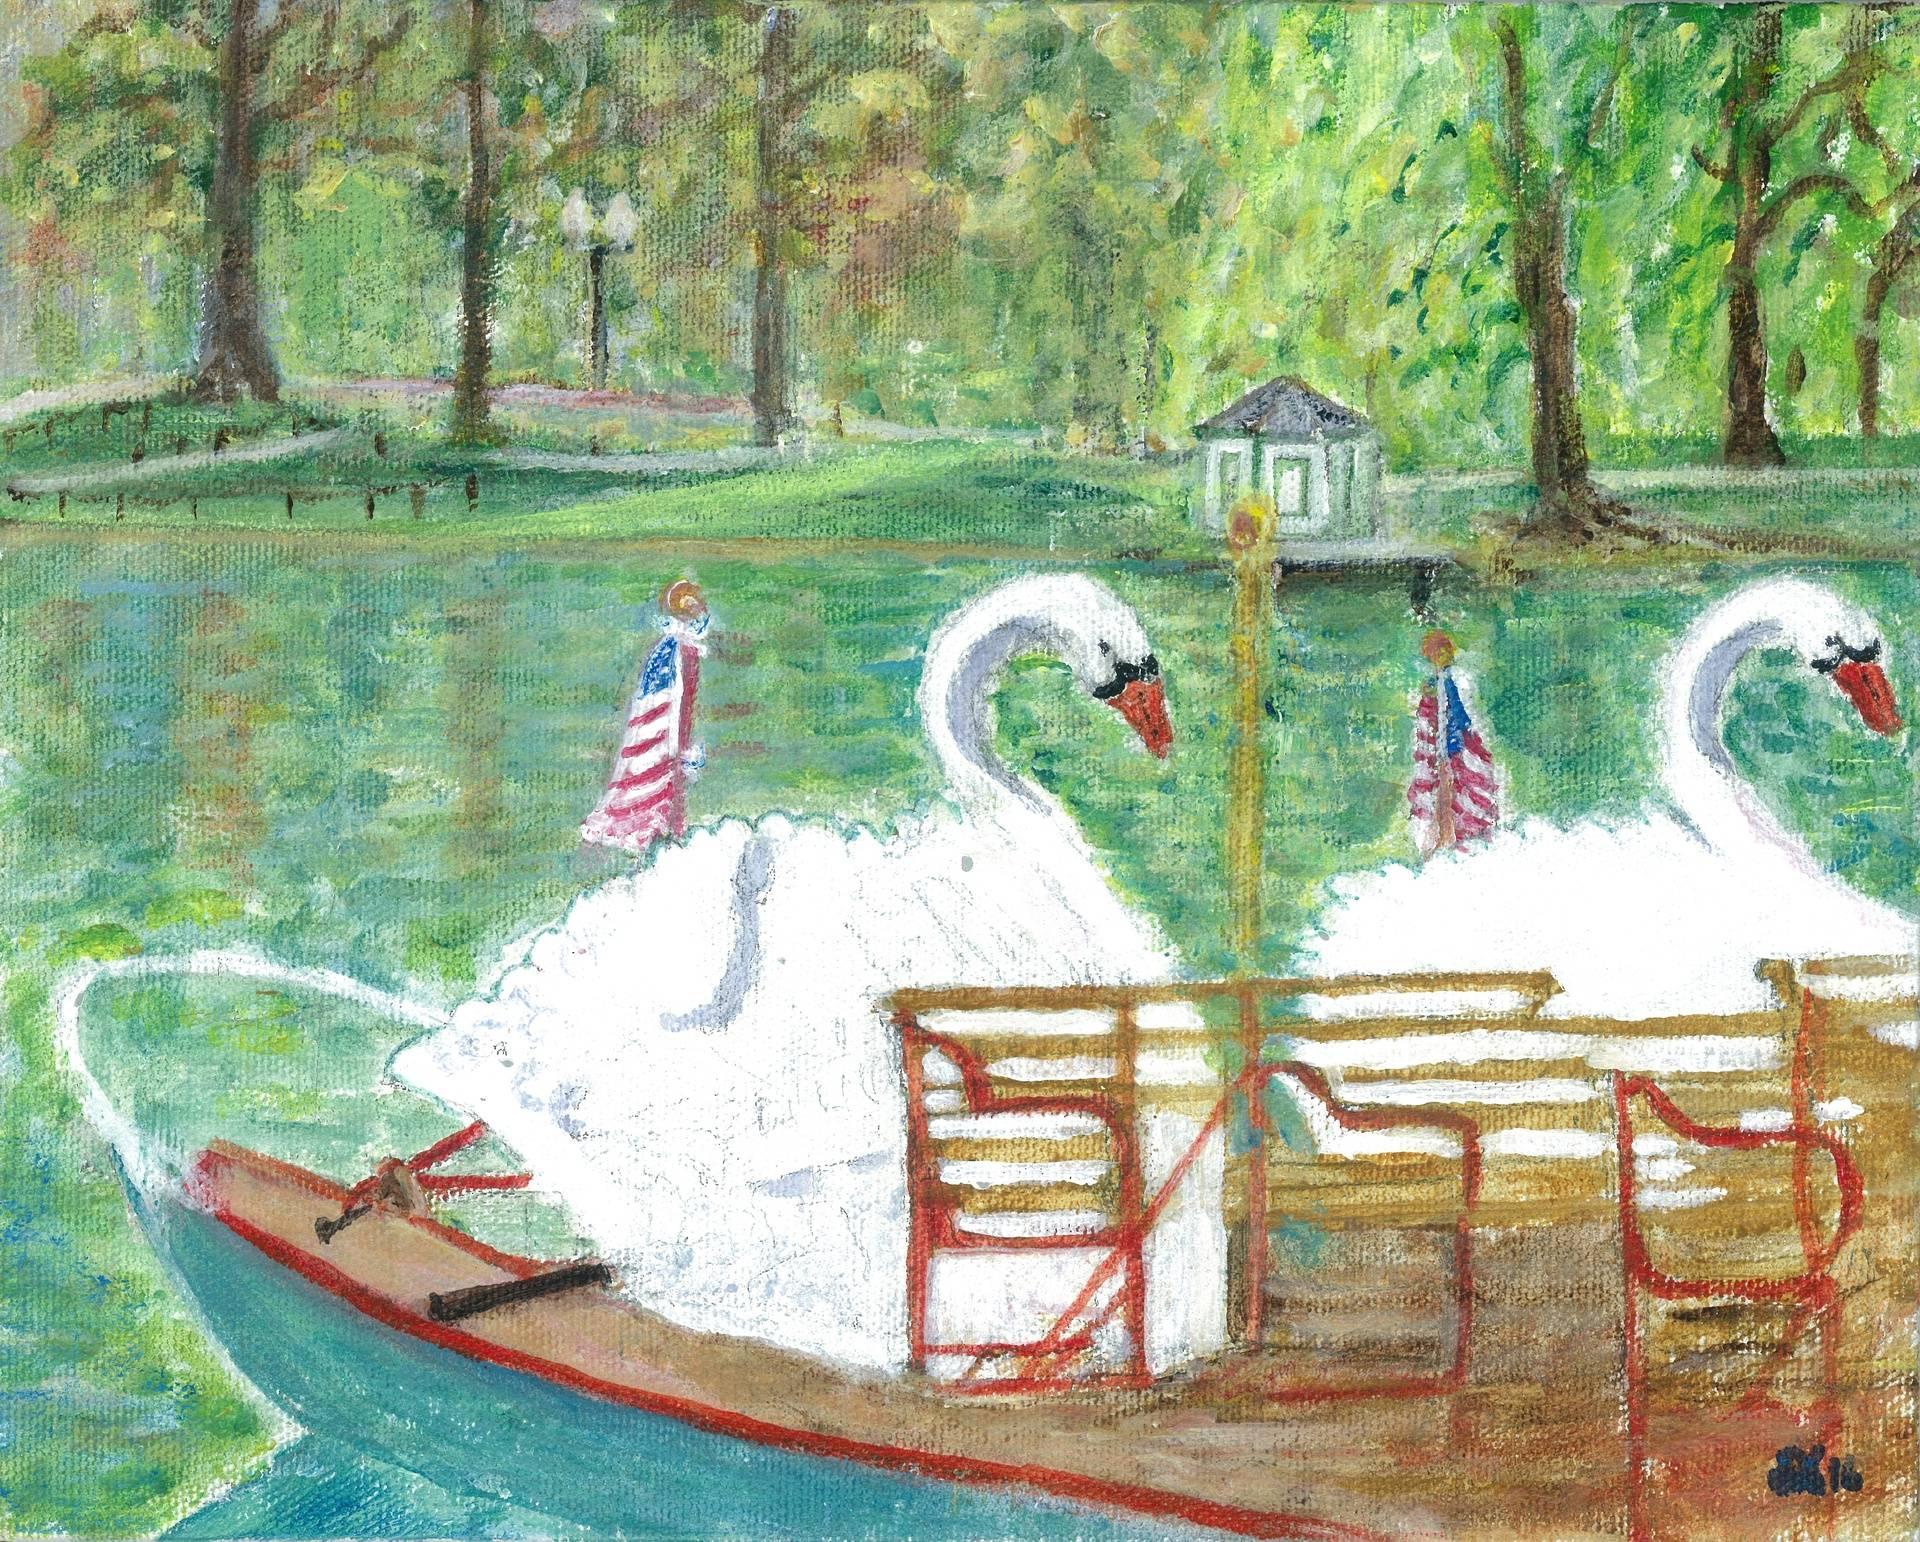 Historic Swan Boats - Boston Public Garden, Boston